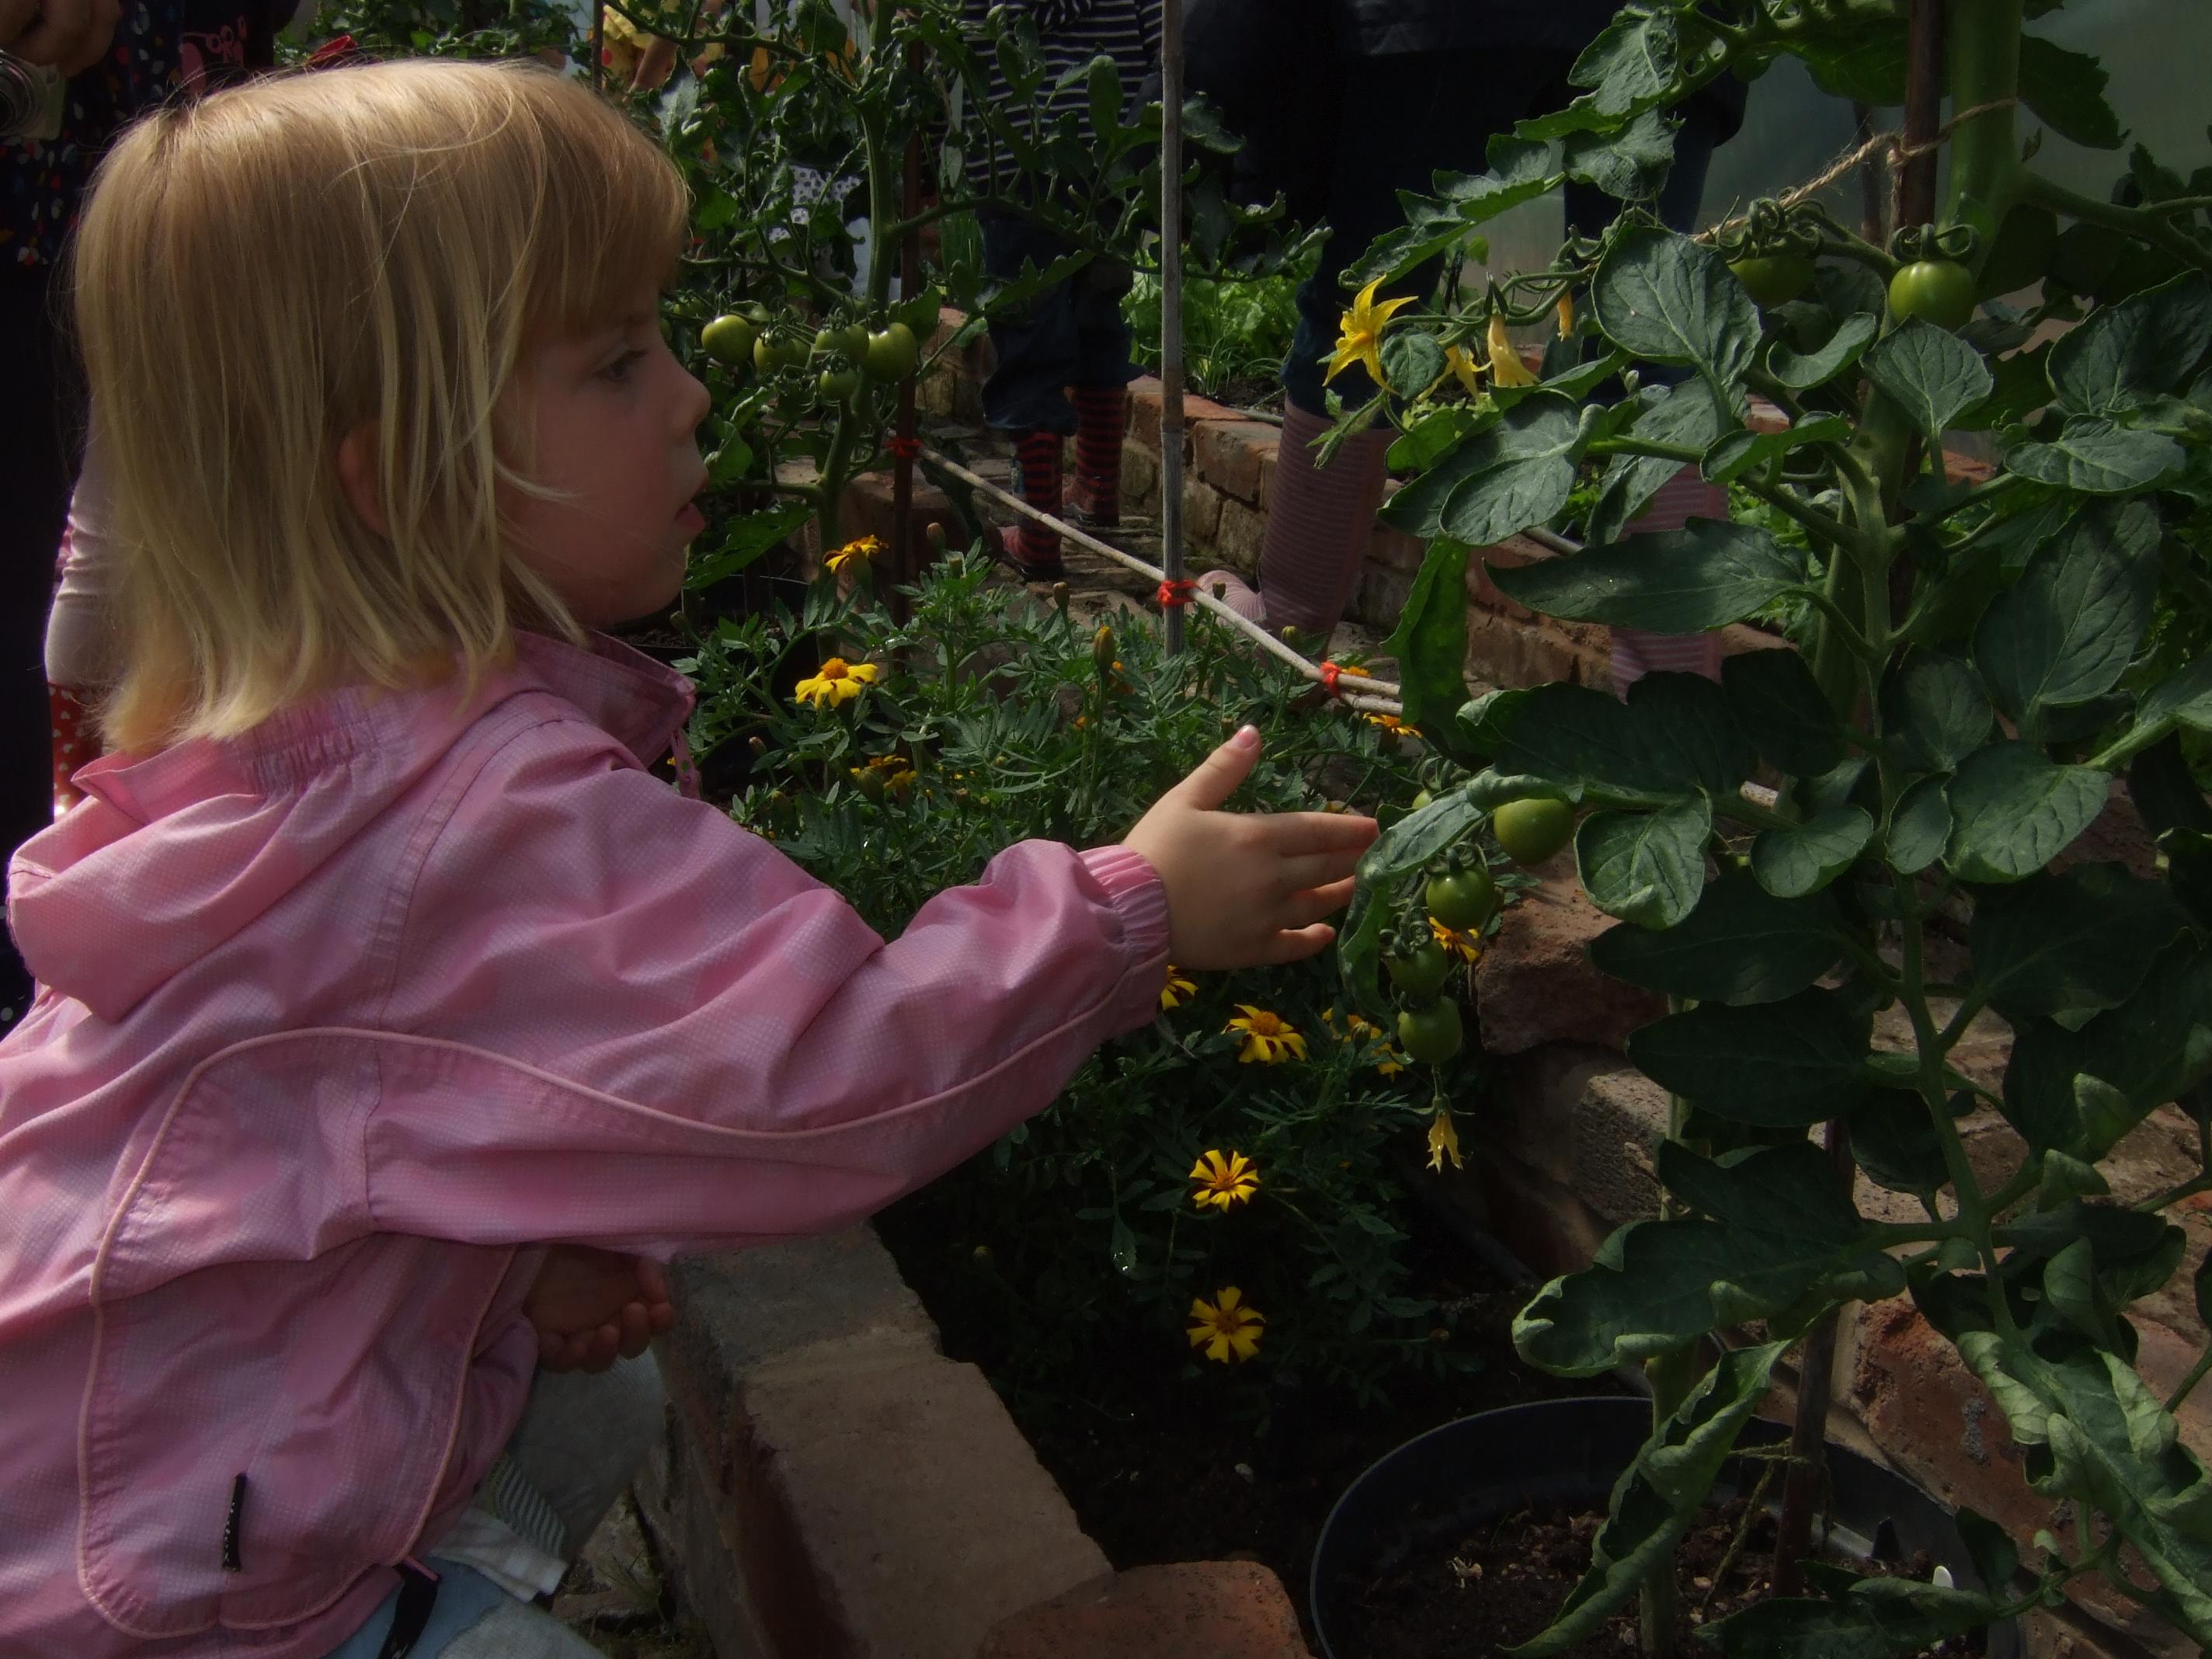 children smelling flowers